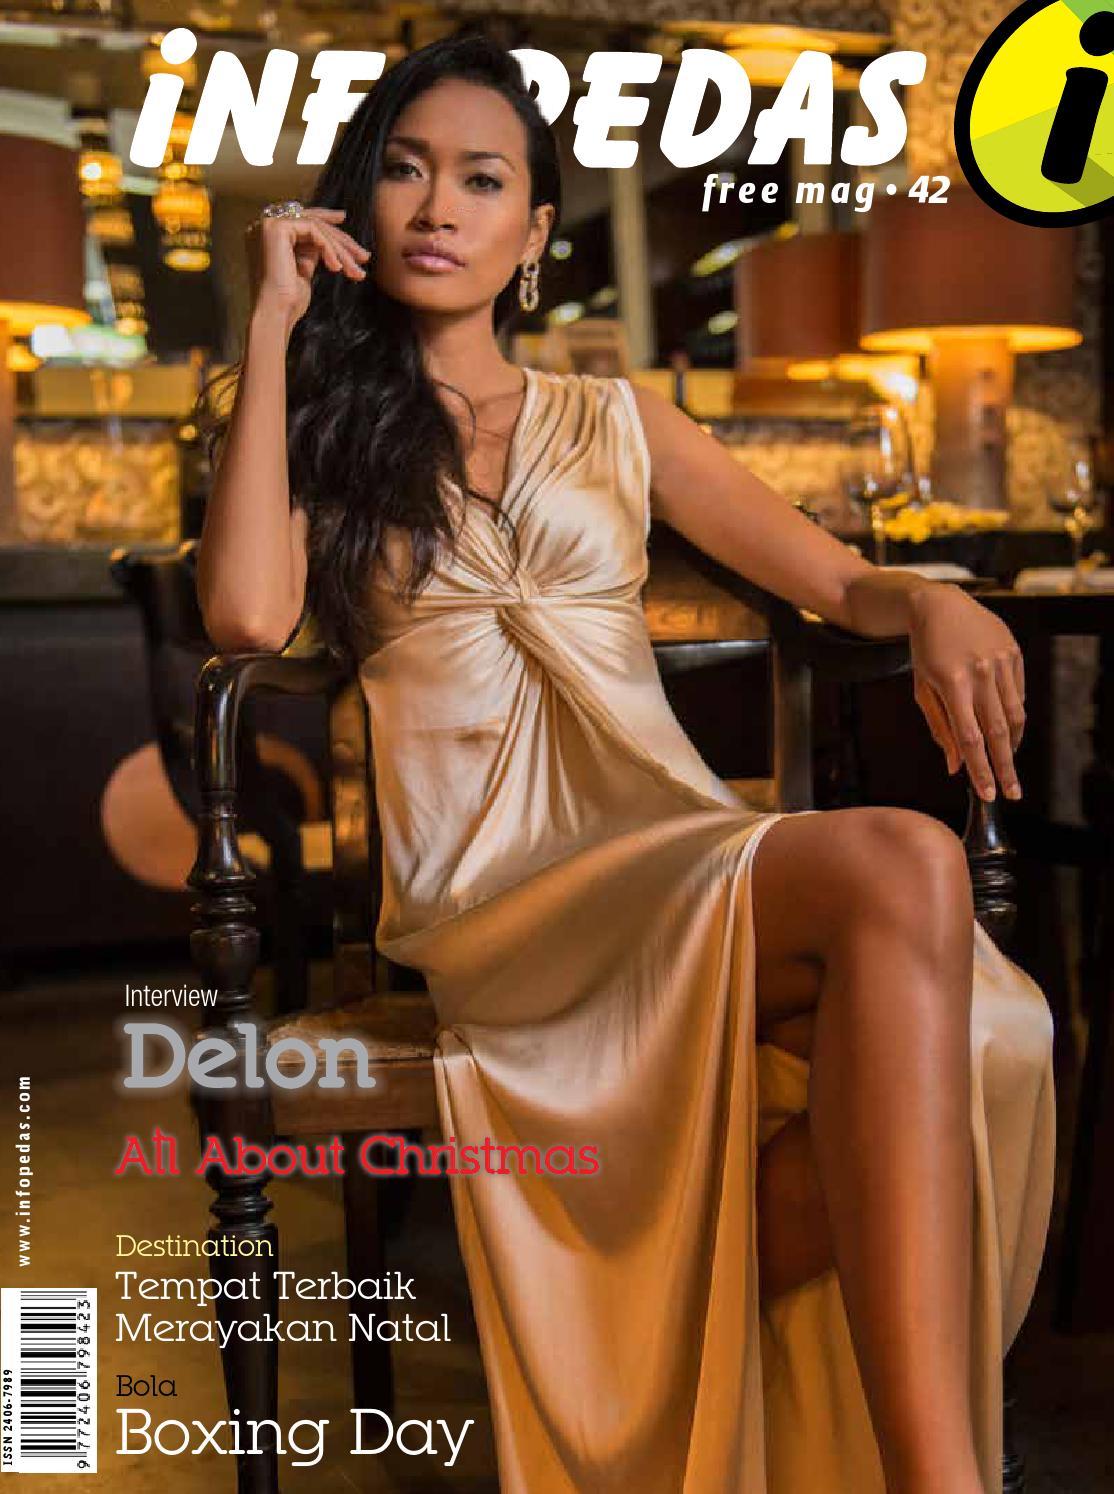 Majalah Infopedas Edisi 42 By Pedas Issuu E Voucher 200 Double Point Sticker Tiara Gatzu Monang Maning Toko Soputan